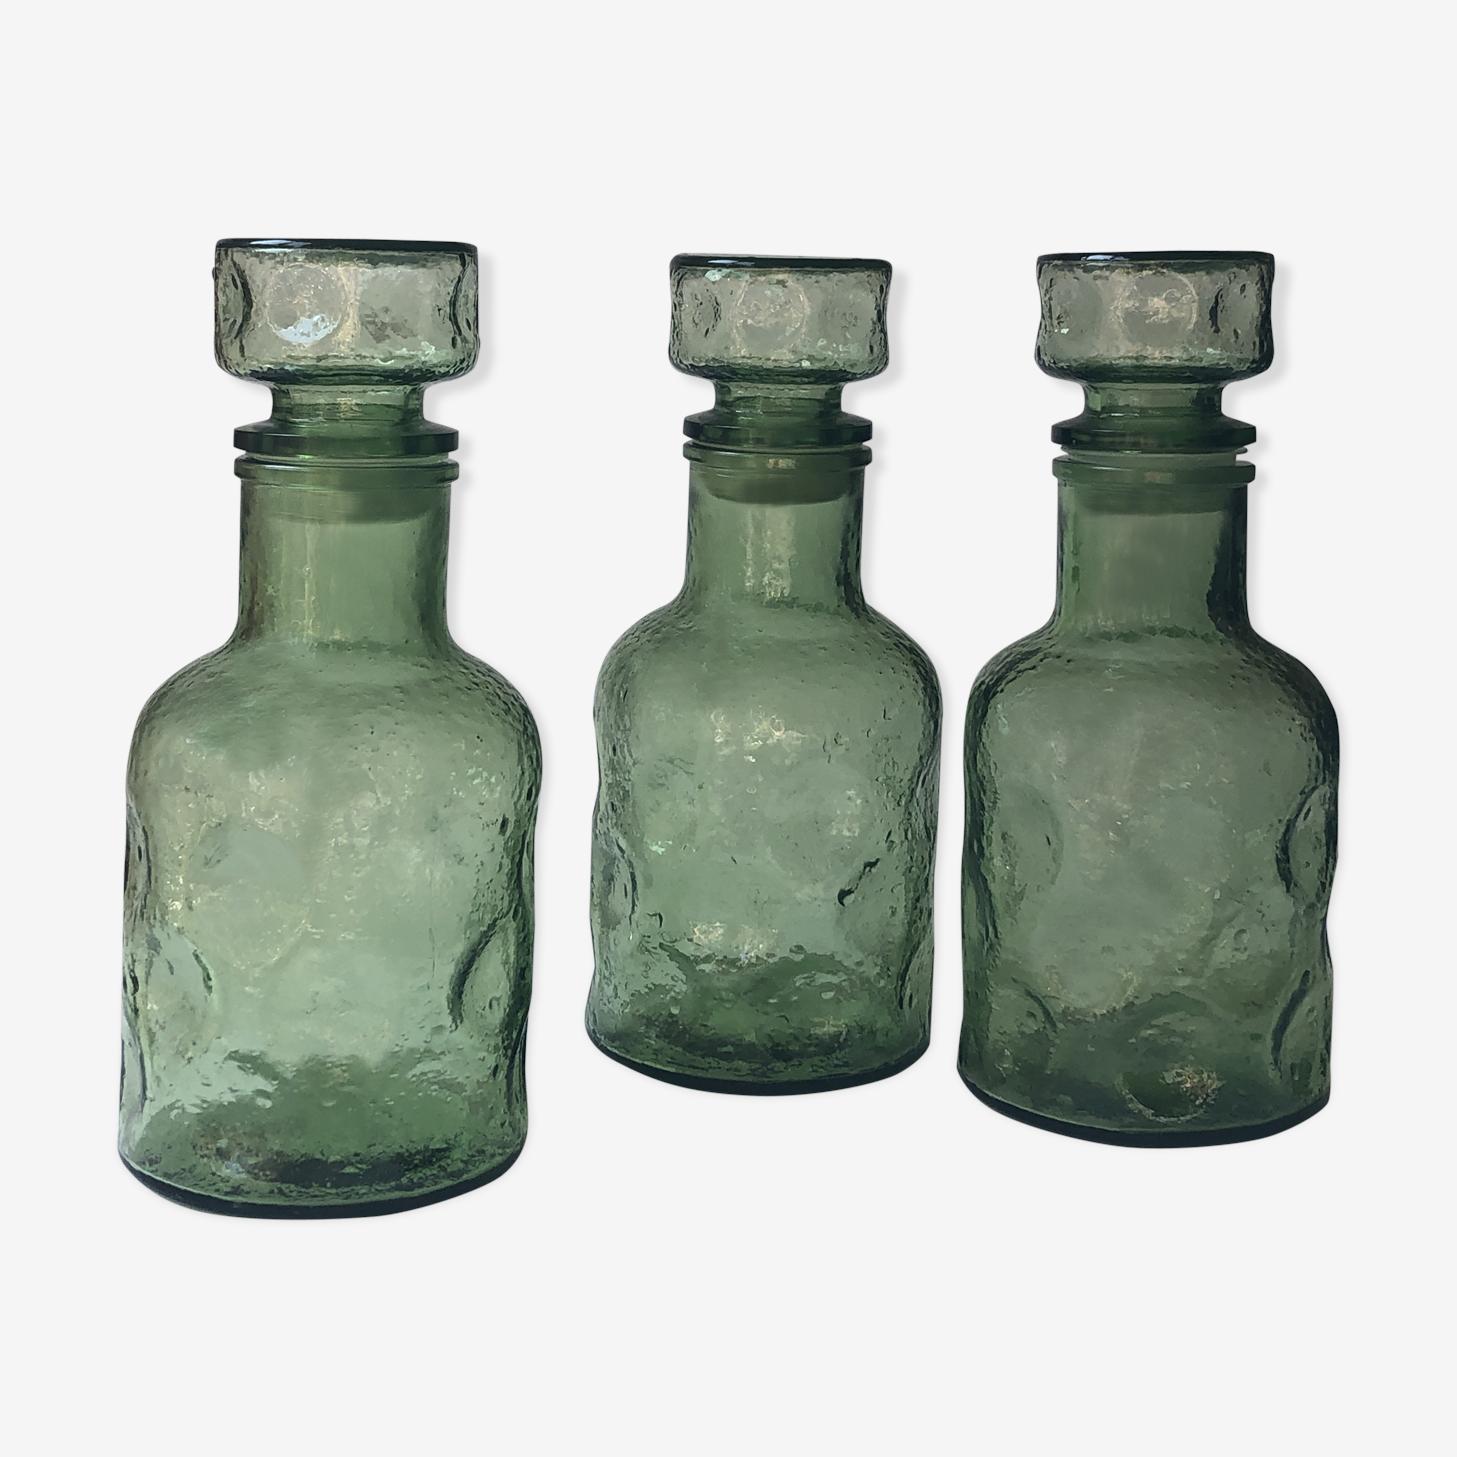 Ensemble de 3 flacons en verre vert